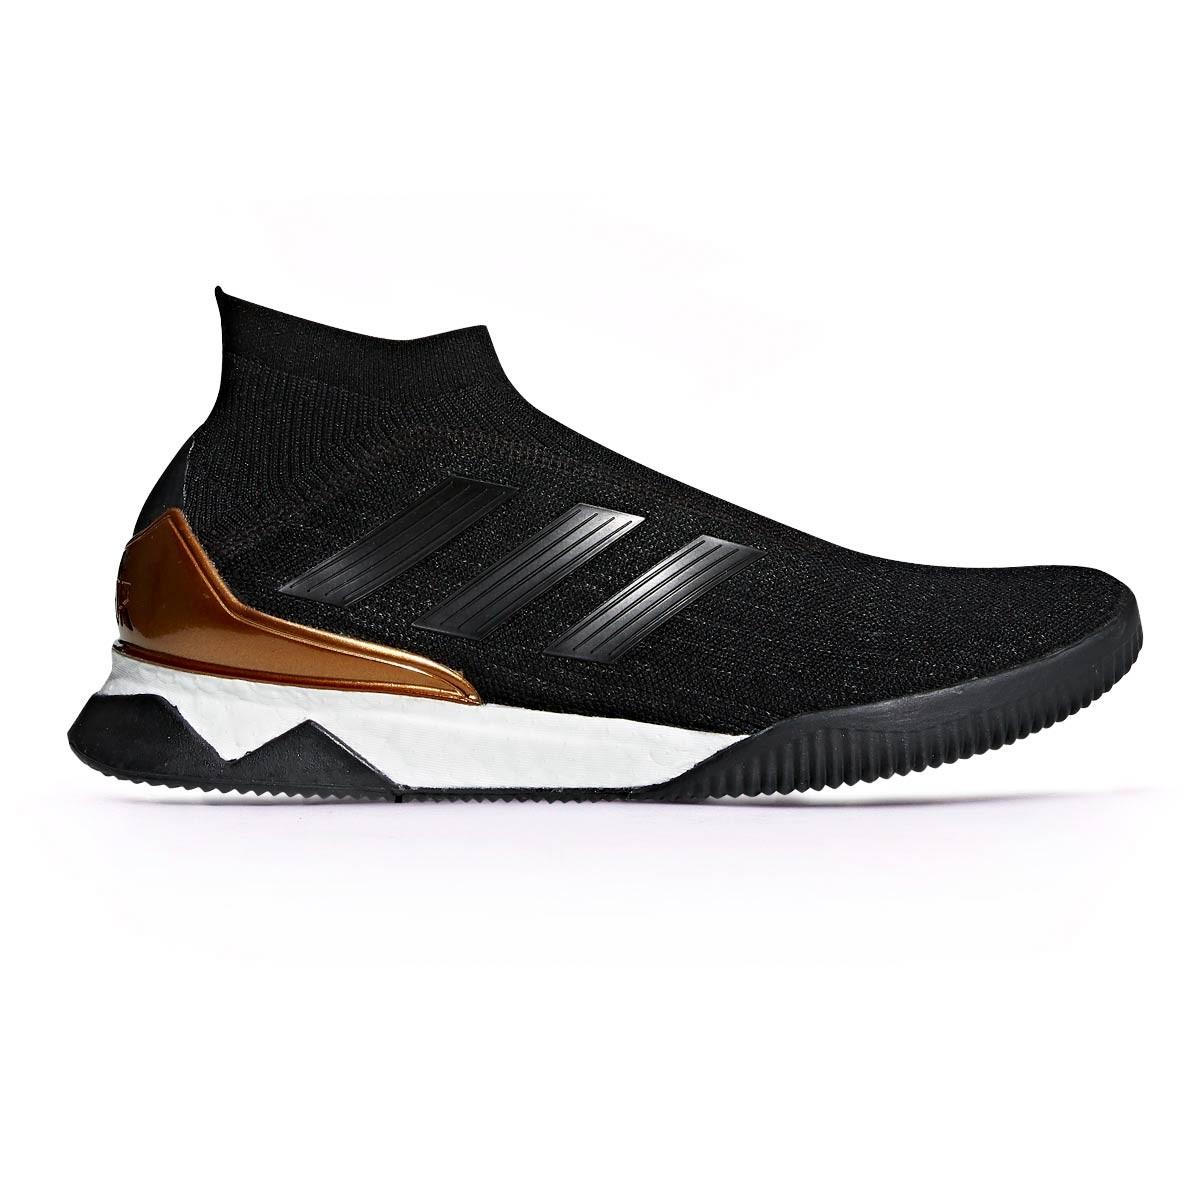 Adidas Predator Tango 18+ TR - Black/Solar Red eastbay cheap online DHmmC